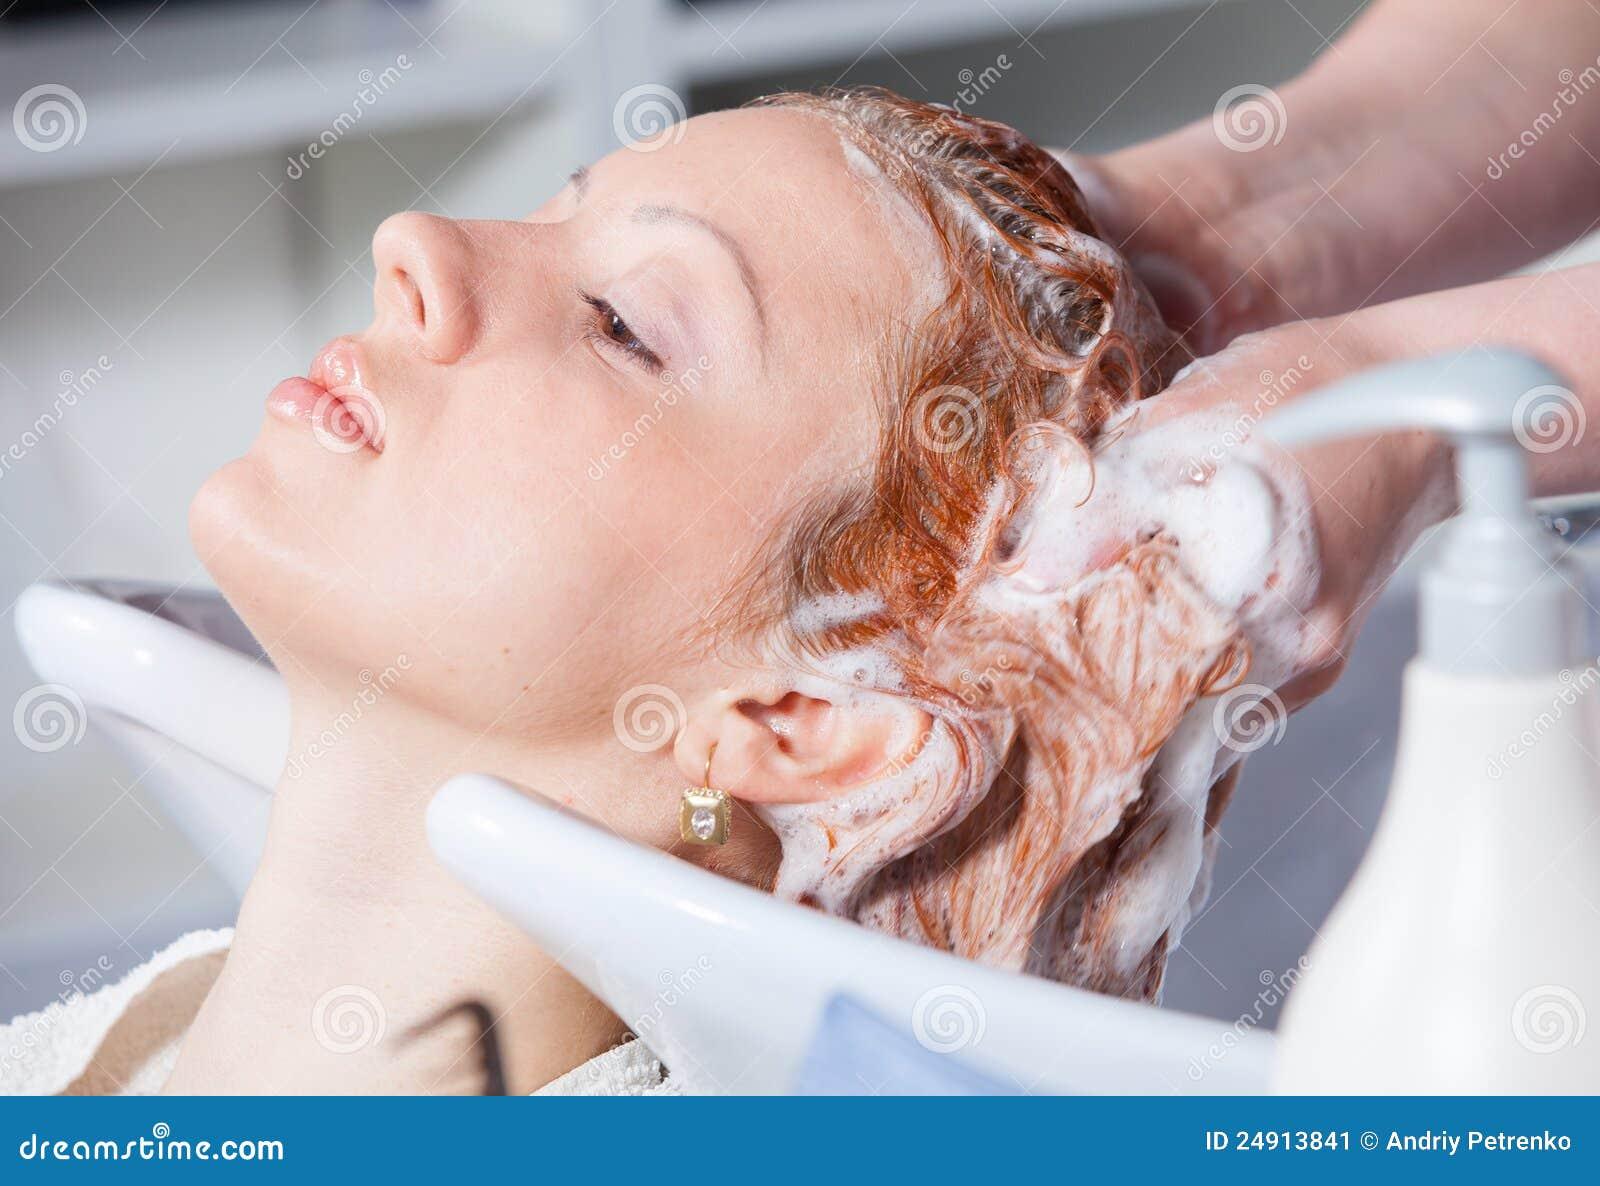 Hair washing at a hairdressing salon stock image image for Wash hair salon